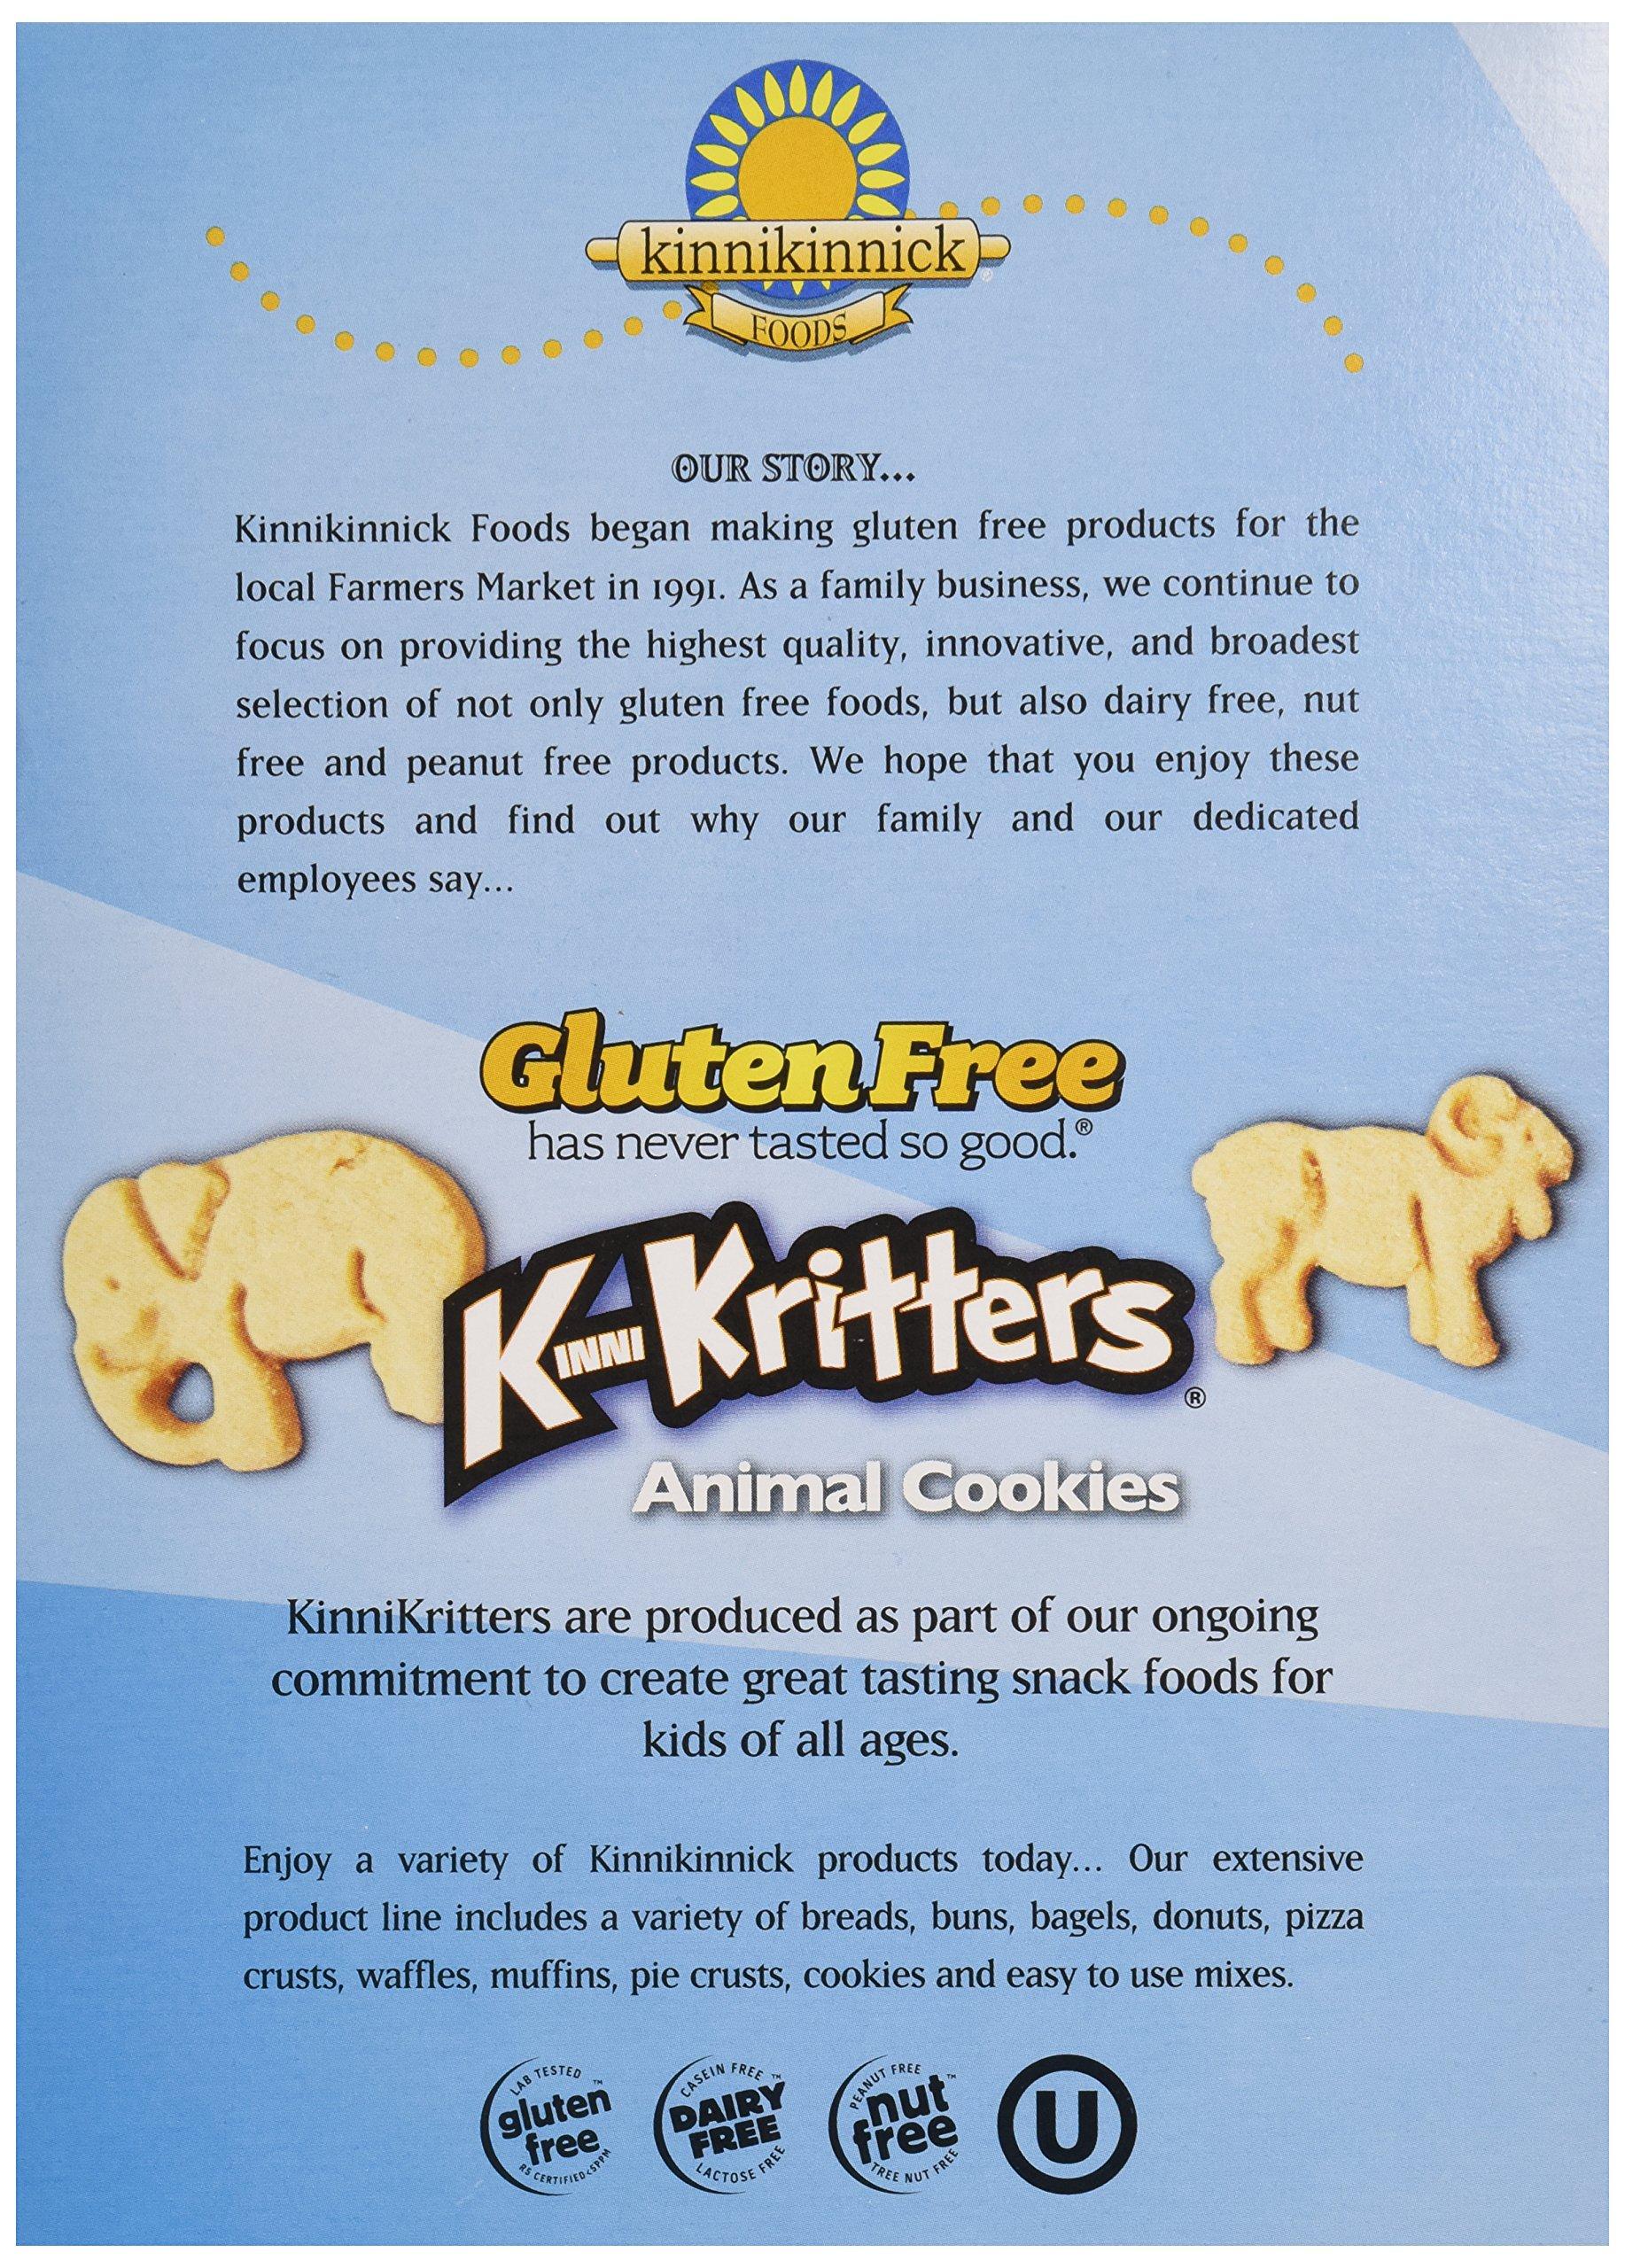 Kinnikinnick, Animal Cookies, Gluten Free, Wheat Free, Dairy Free, 8 oz by Kinnikinnick (Image #5)